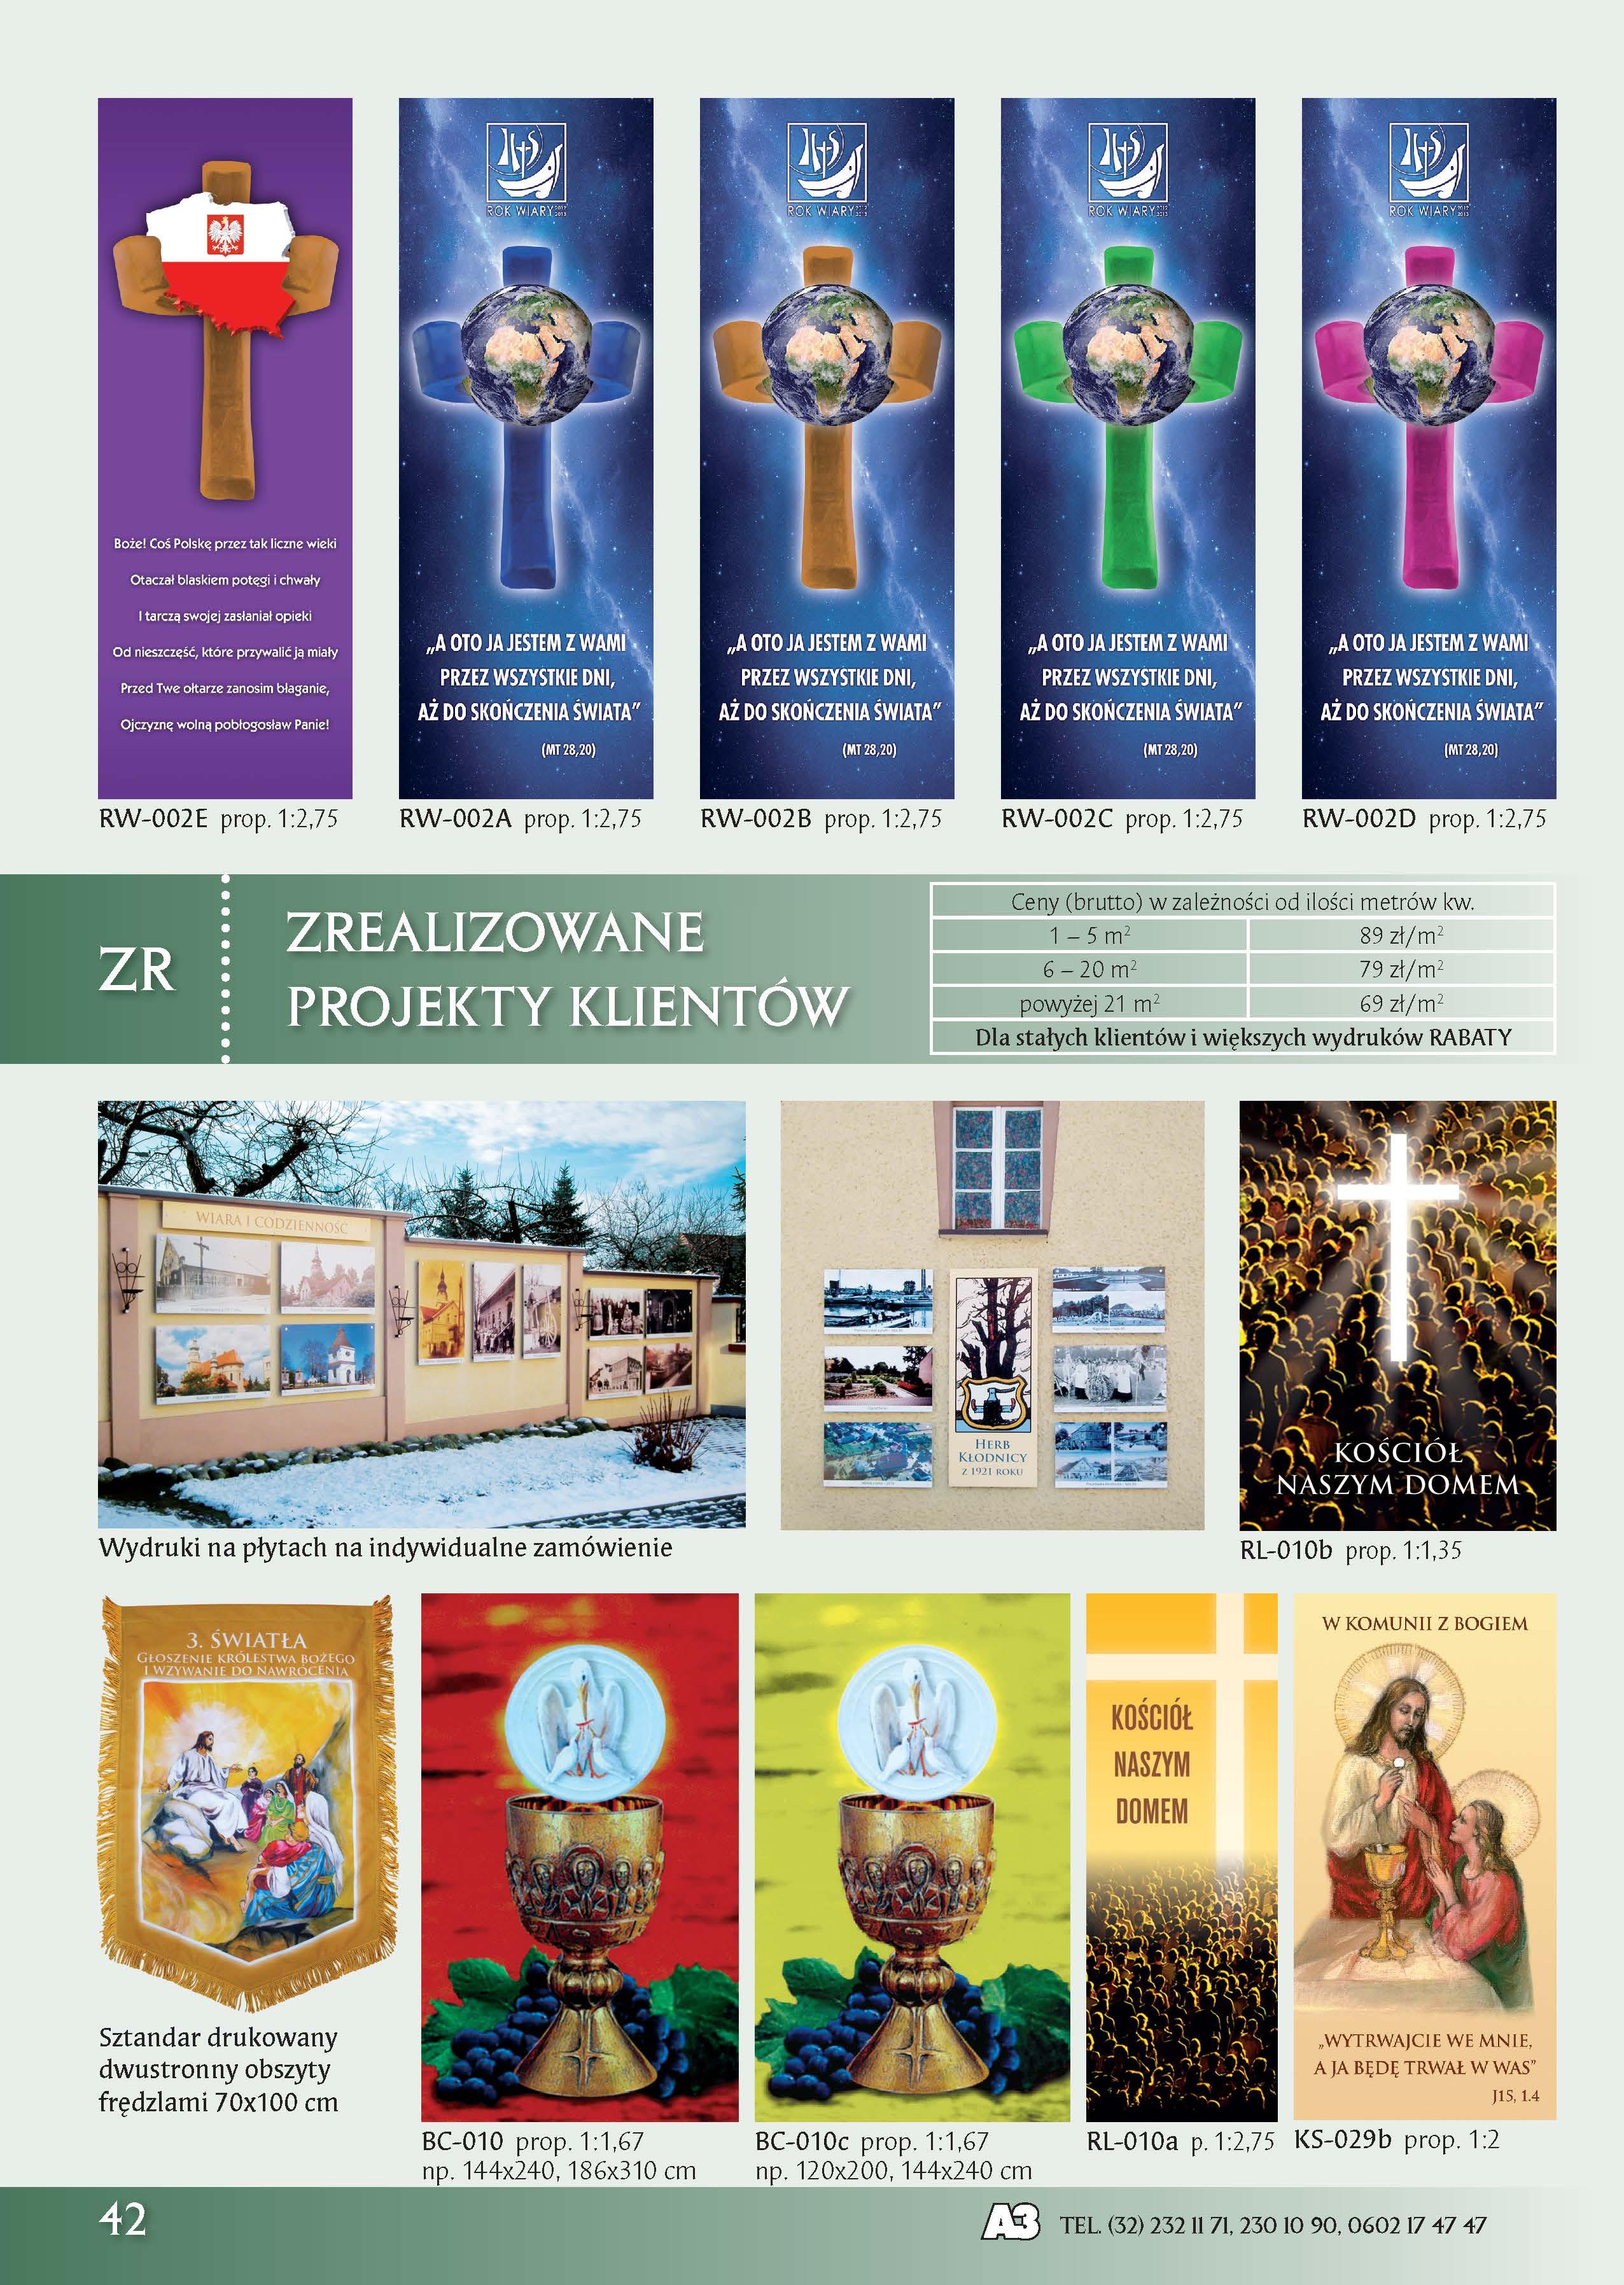 Obrazy i Obrazki Religijne, Grafika Liturgiczna